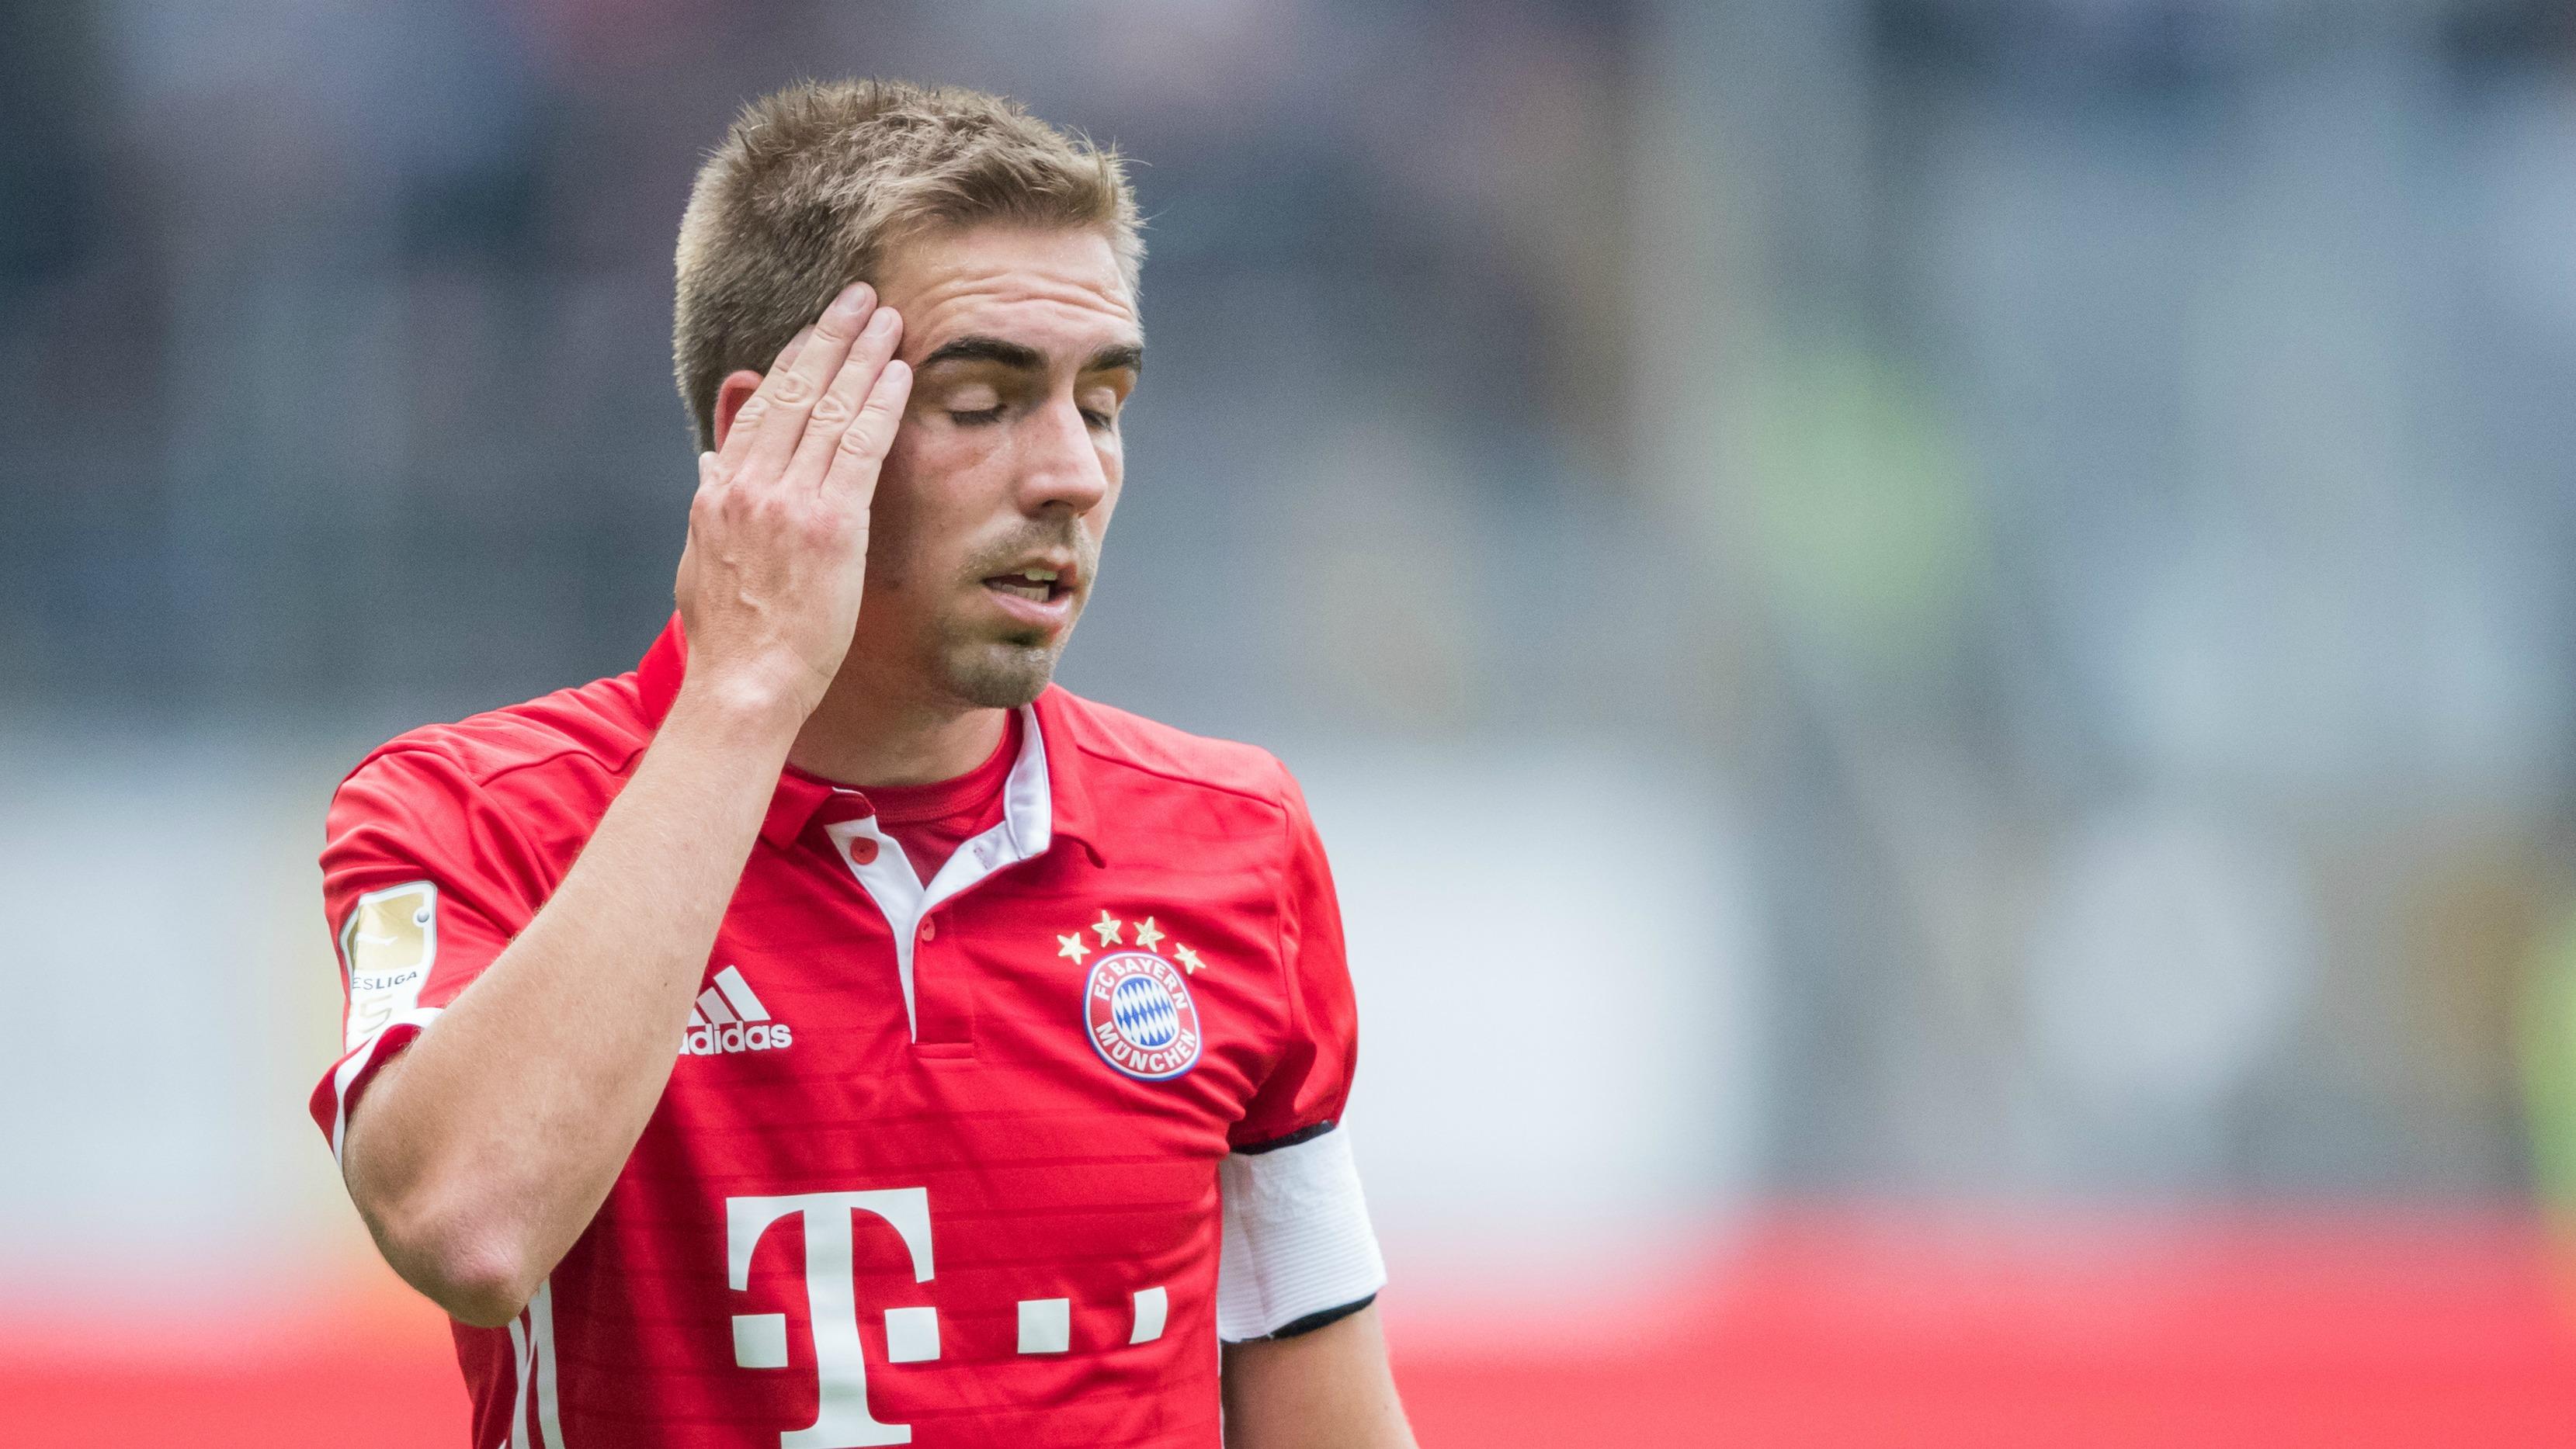 Why Bayern Munich are suddenly struggling under Carlo Ancelotti